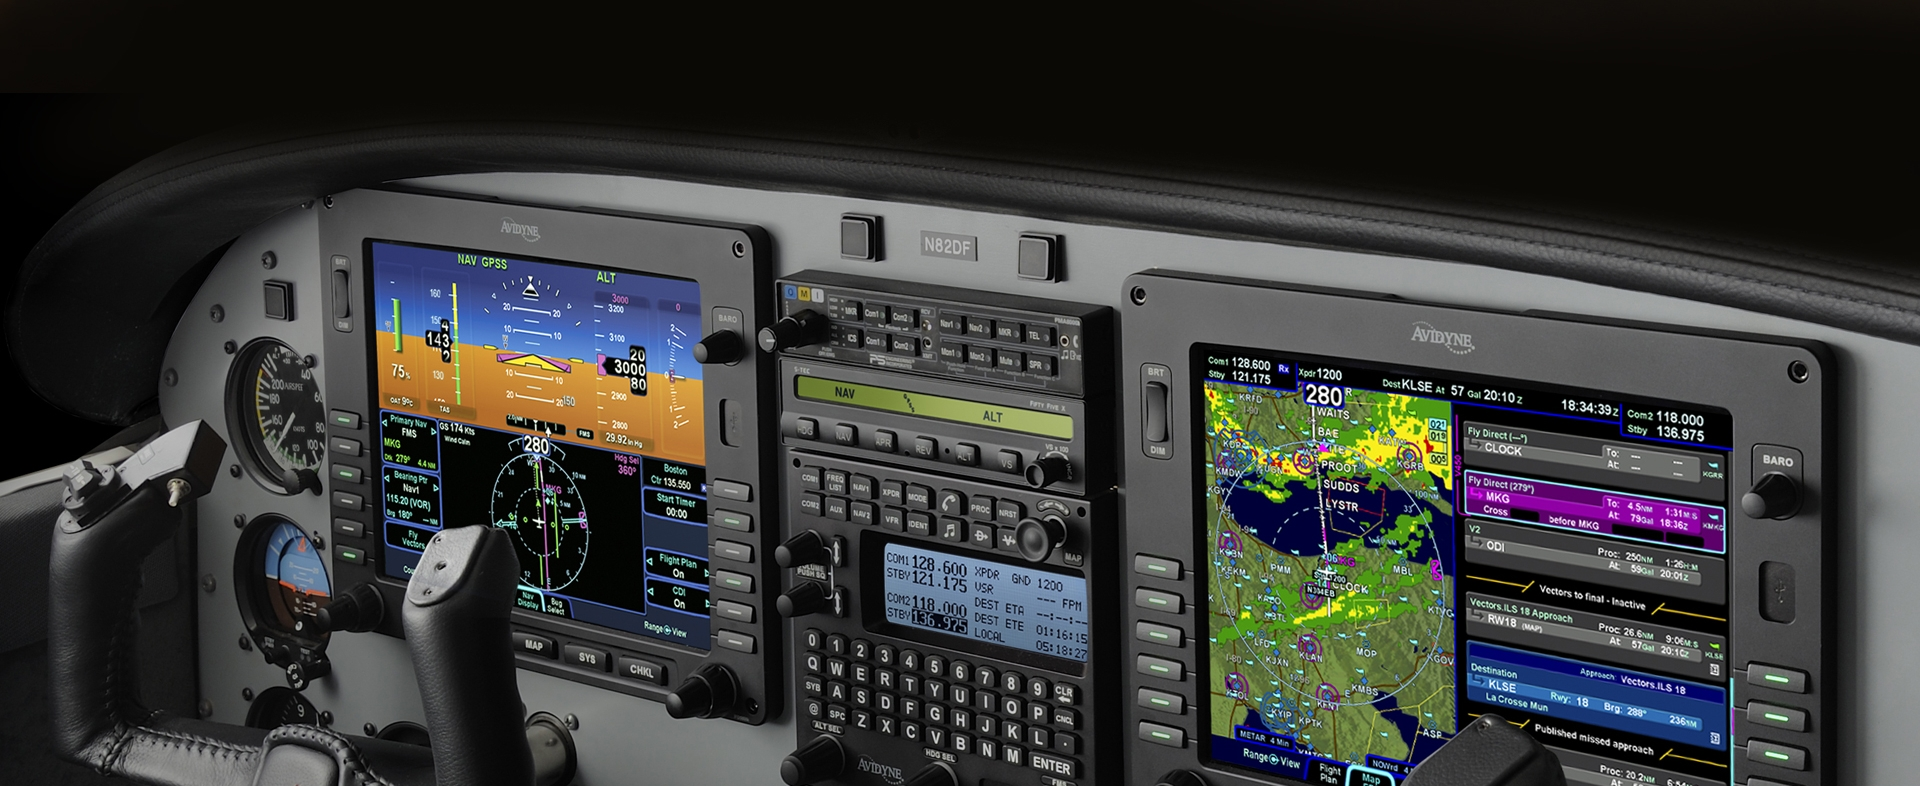 Avionics - RGV Aviation - The UKs leading Glass Cockpit